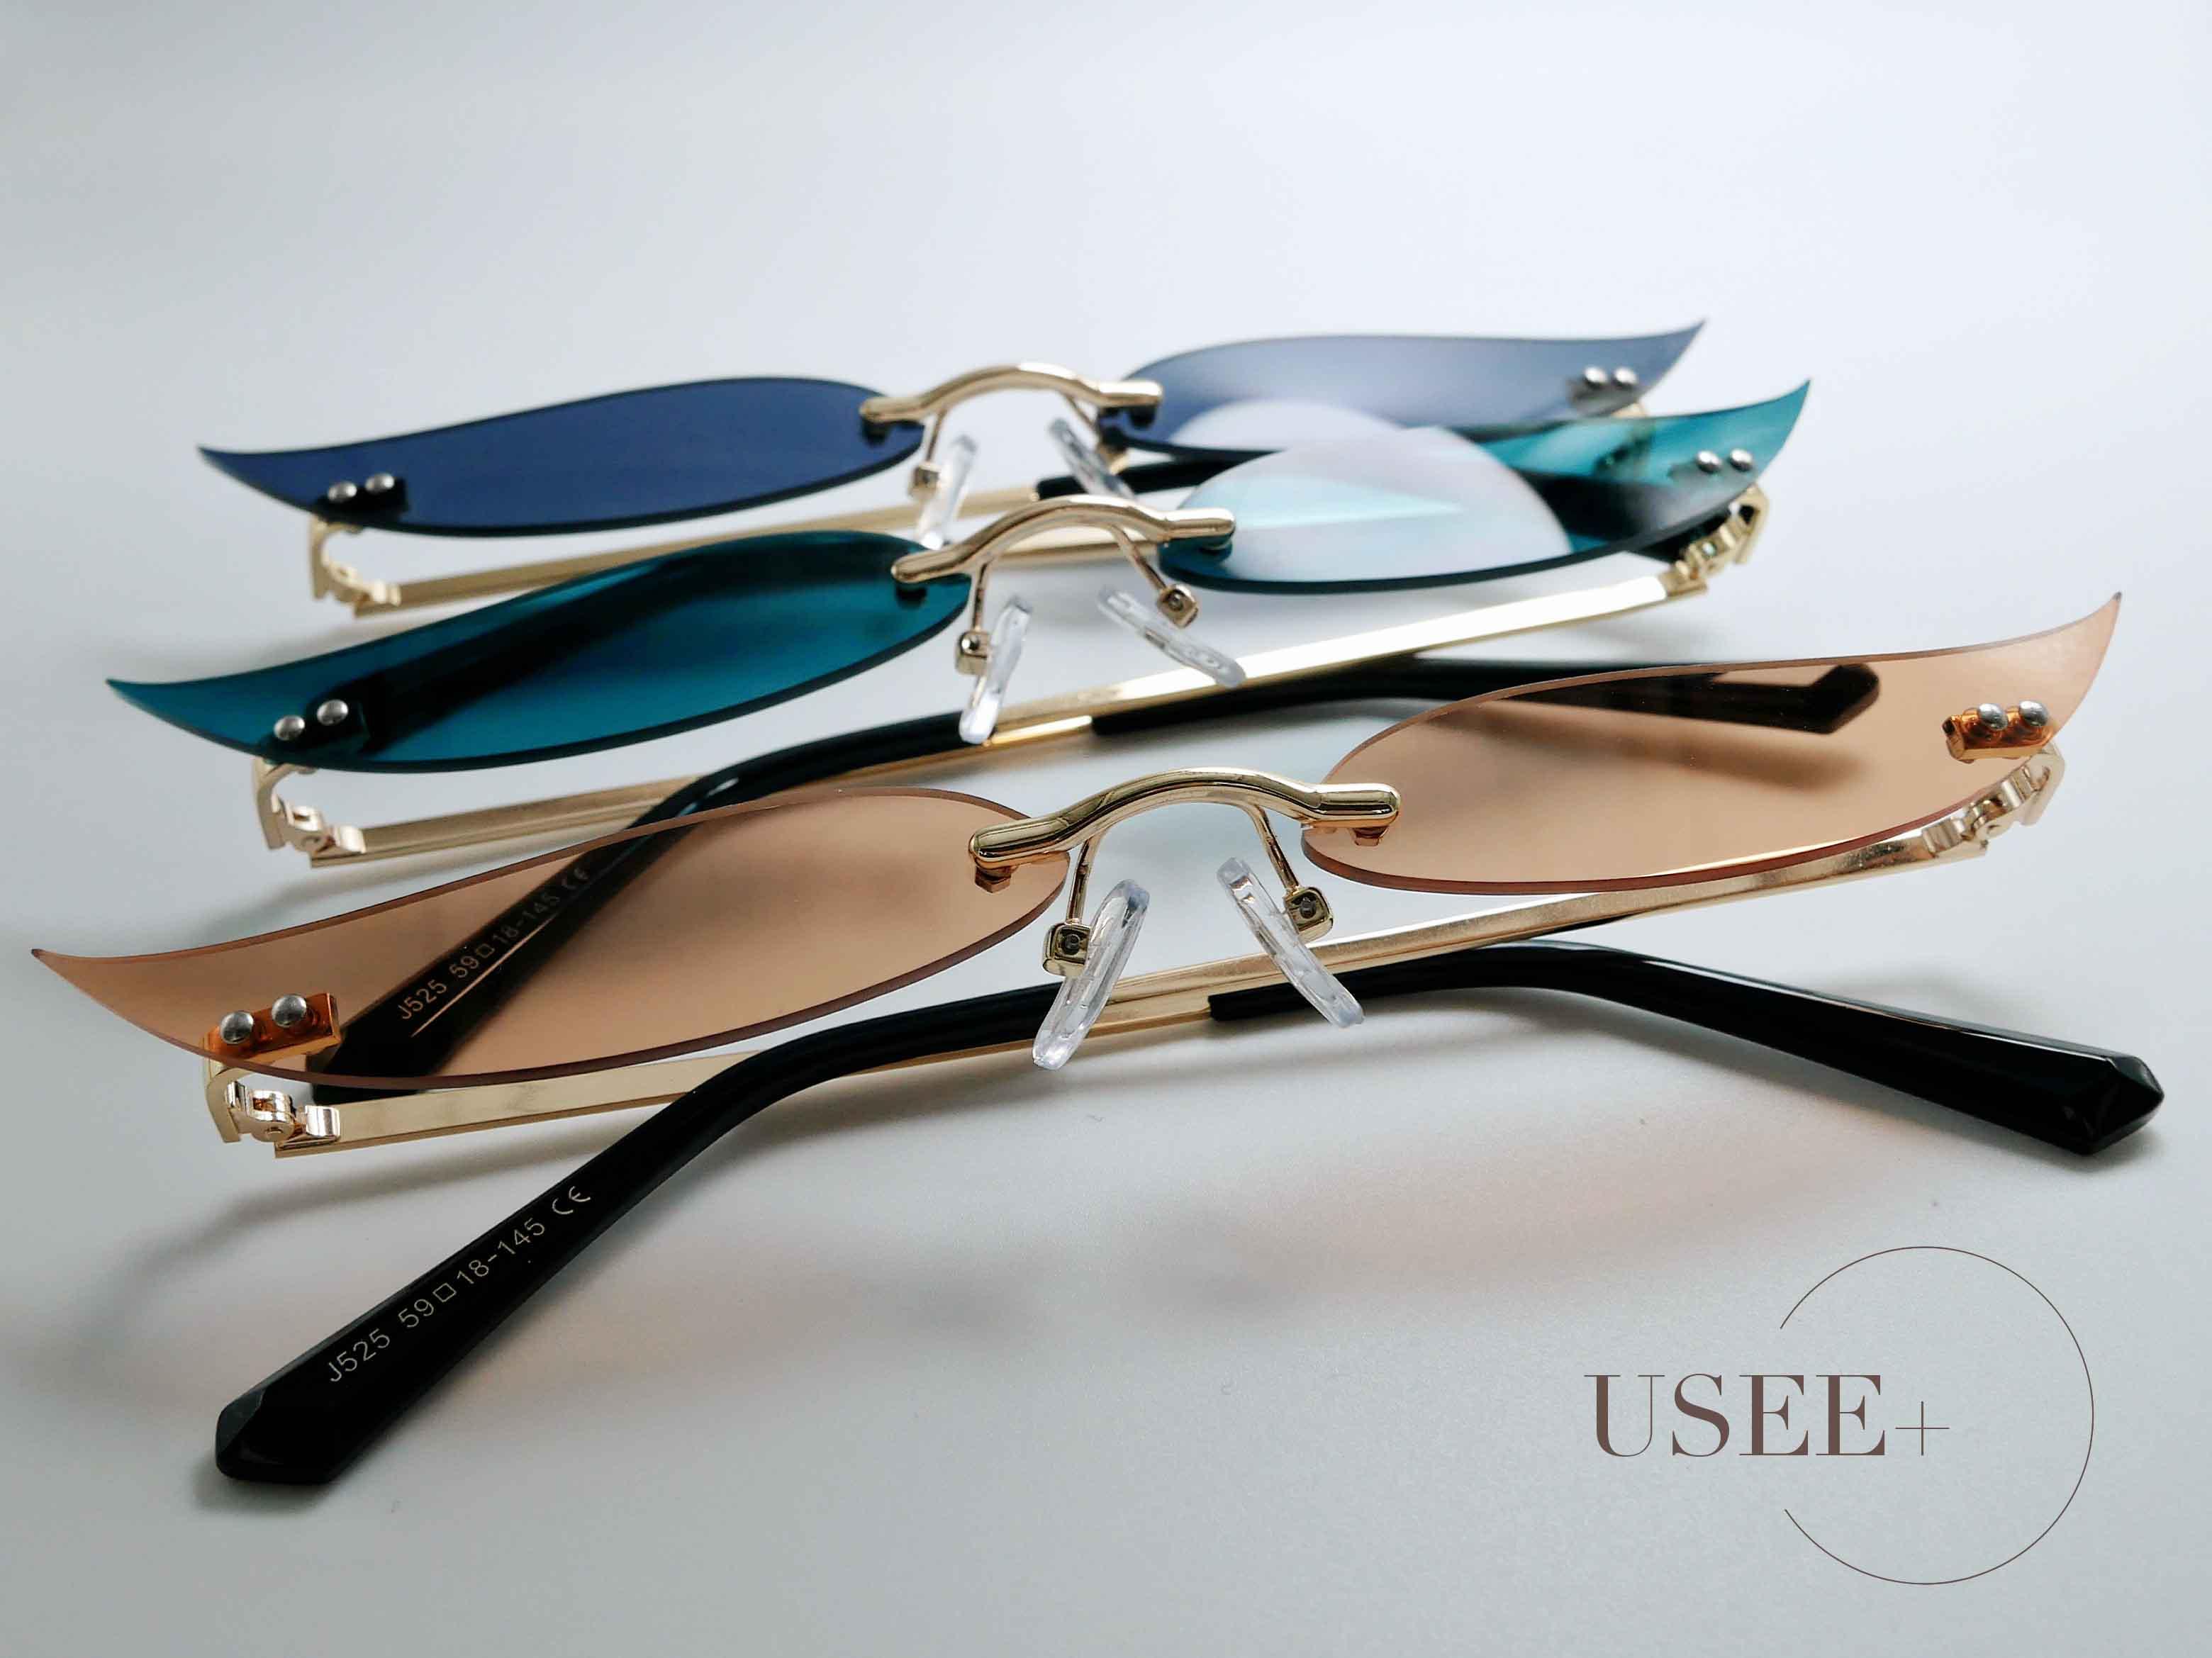 USEE+ 有晰眼镜可爱趣味搞怪墨镜